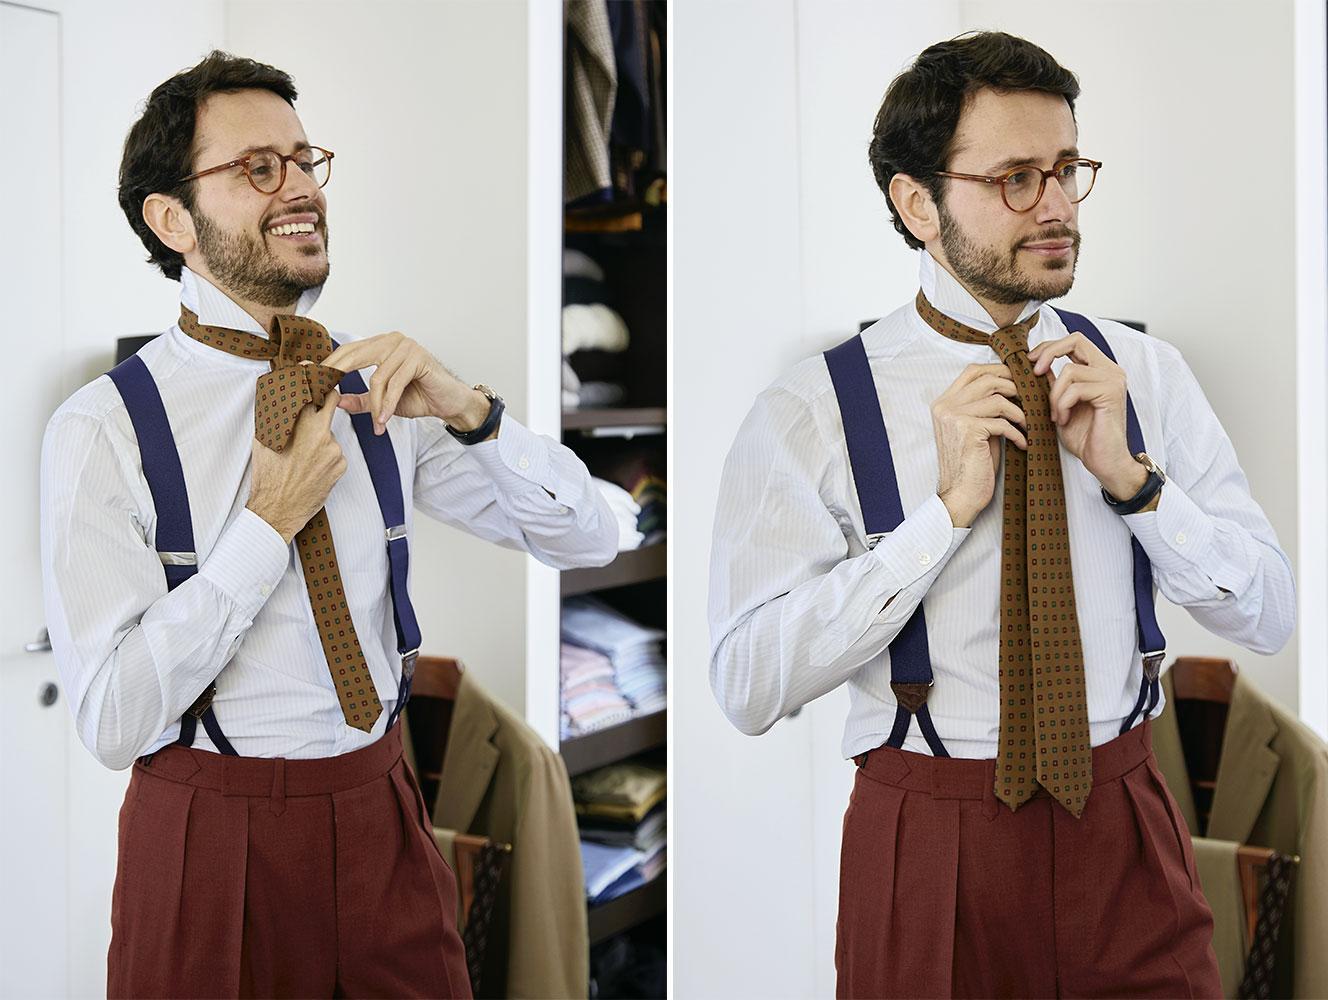 Fabio Attanasio, The Bespoke Dudes, Casa, Milano, Stile, Blog, Occhiali, Influencer, Instagram